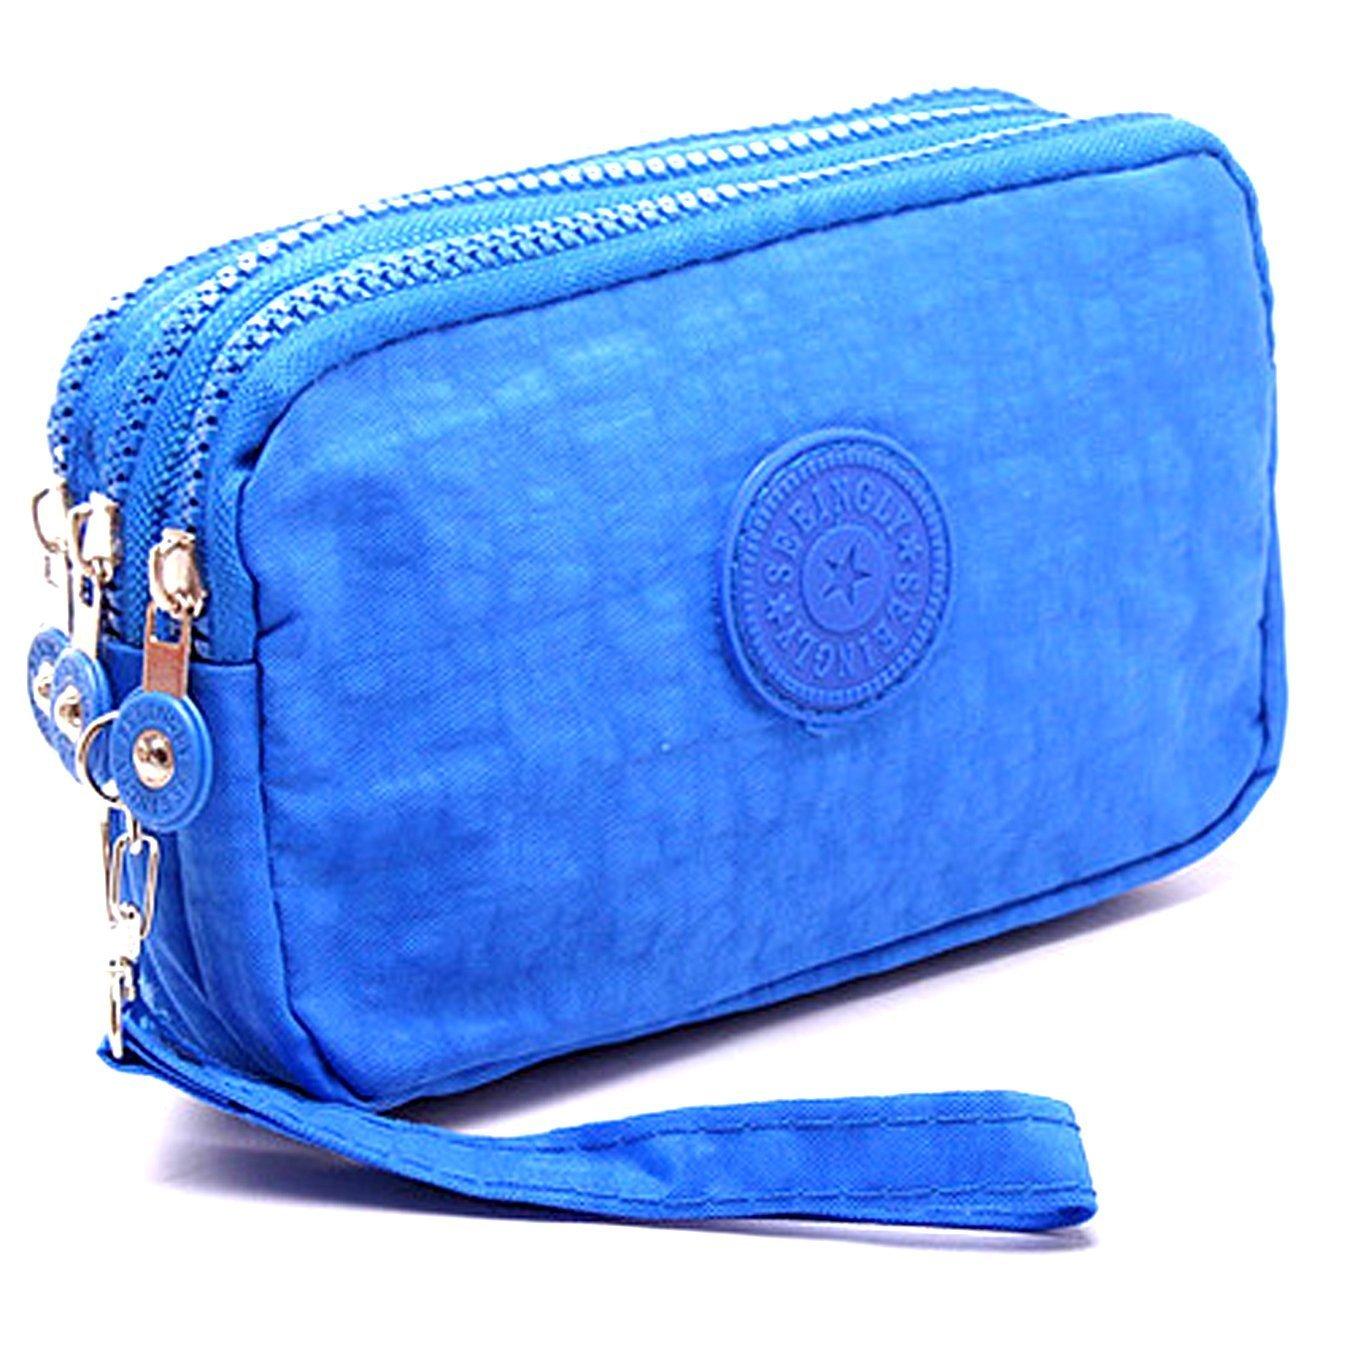 SAIANKE Multifunction Three Layer Zipper Closure Insert Handbag Sport Portable Organiser Purse Cash Key Phone Bag